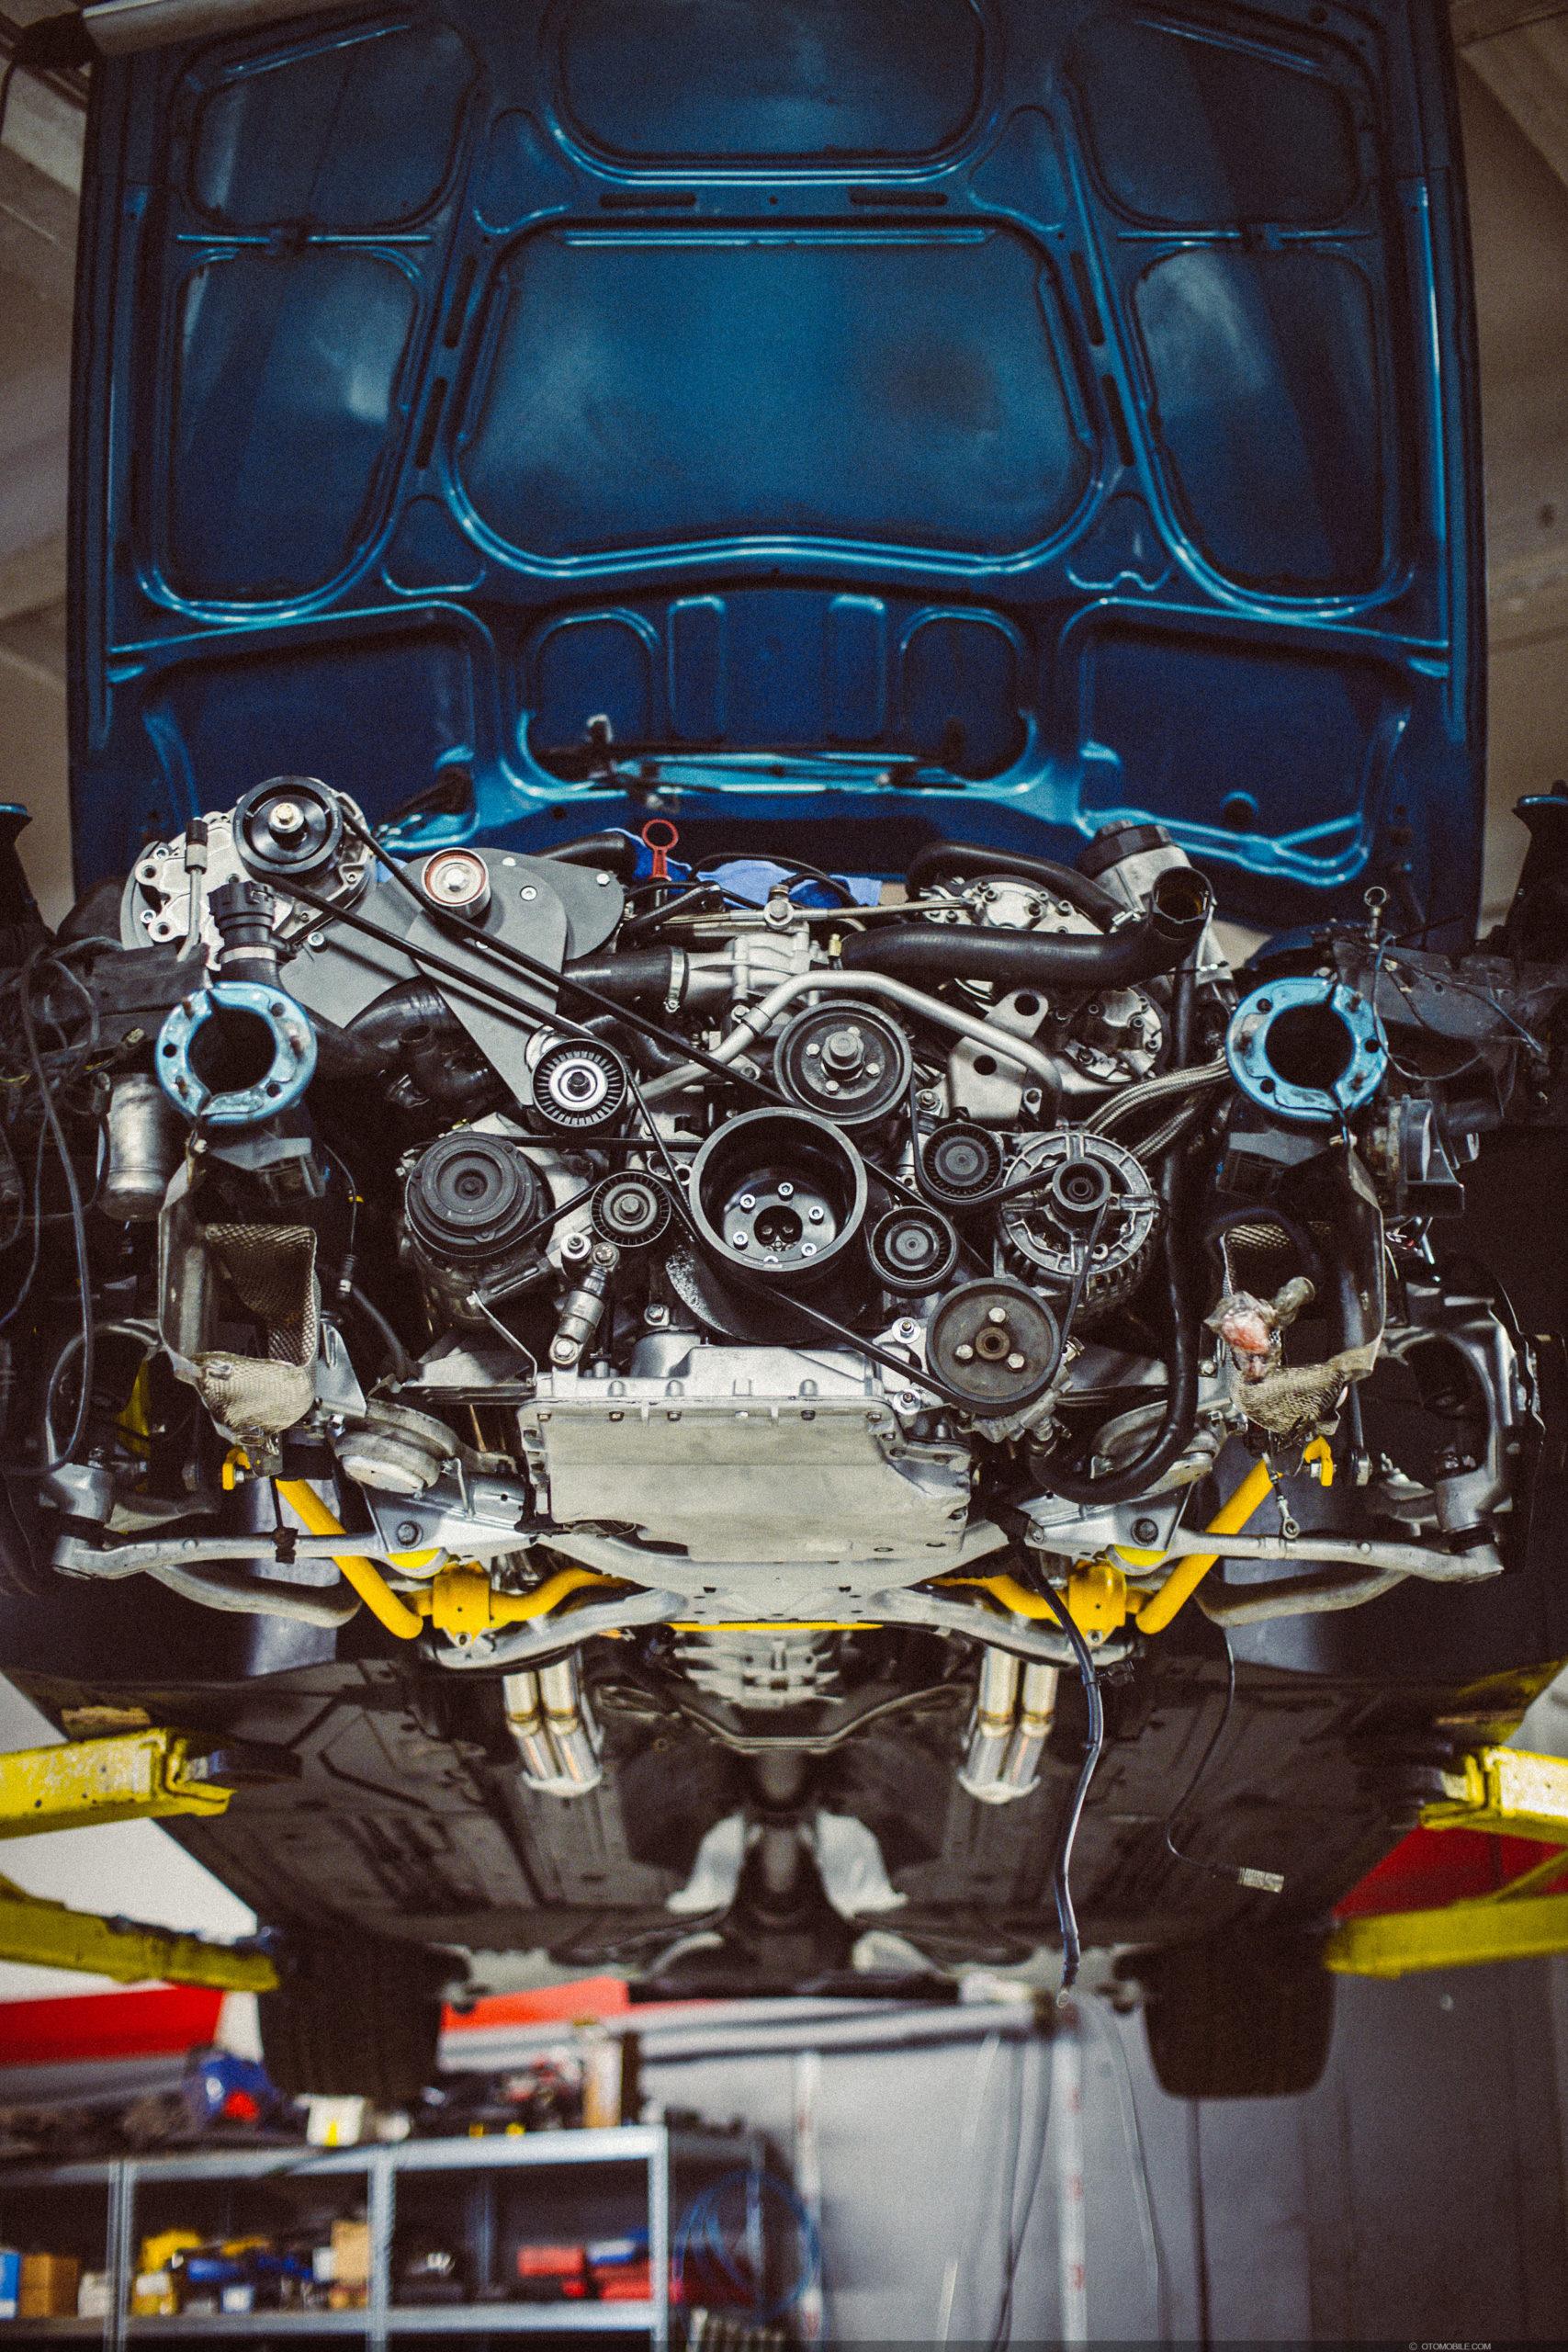 "BMW M5 E39 Touring Wide-Body ESS Supercharged ""Individual Program Atlantis Metallic with Titanic Blau interior. S62 Motor Install with sleeves, balanced crankshaft, balanced piston rods and custom balanced pistons. Workshop @Driftdarbnica, Riga, Latvia"